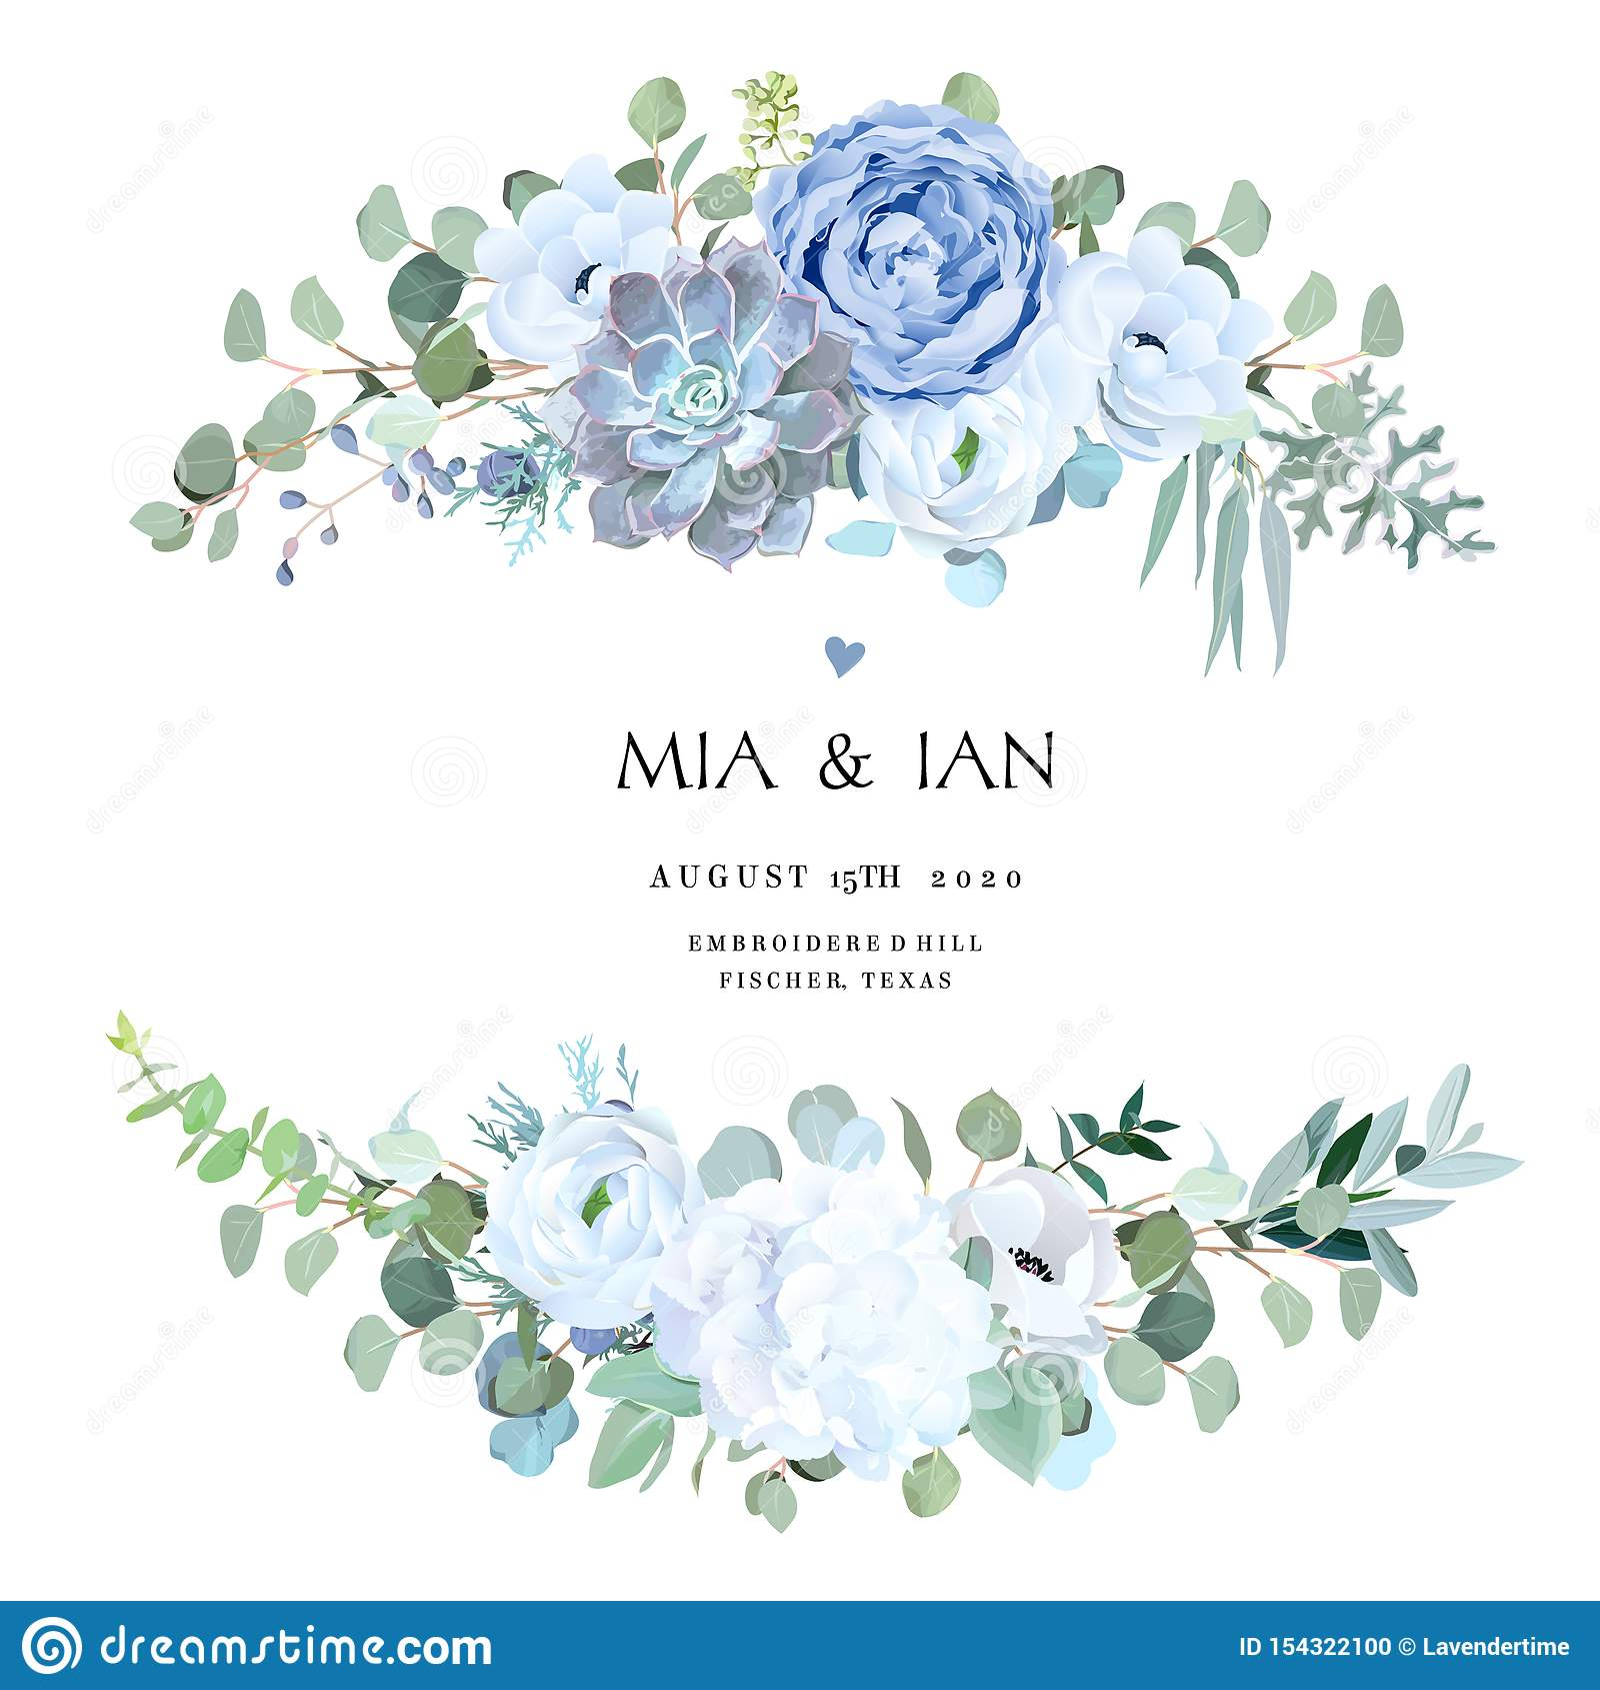 Dusty Blue Rose Echeveria Succulent White Hydrangea Ranunculus Anemone Stock Vector Illustration Of Hydrangea Horizontal 154322100